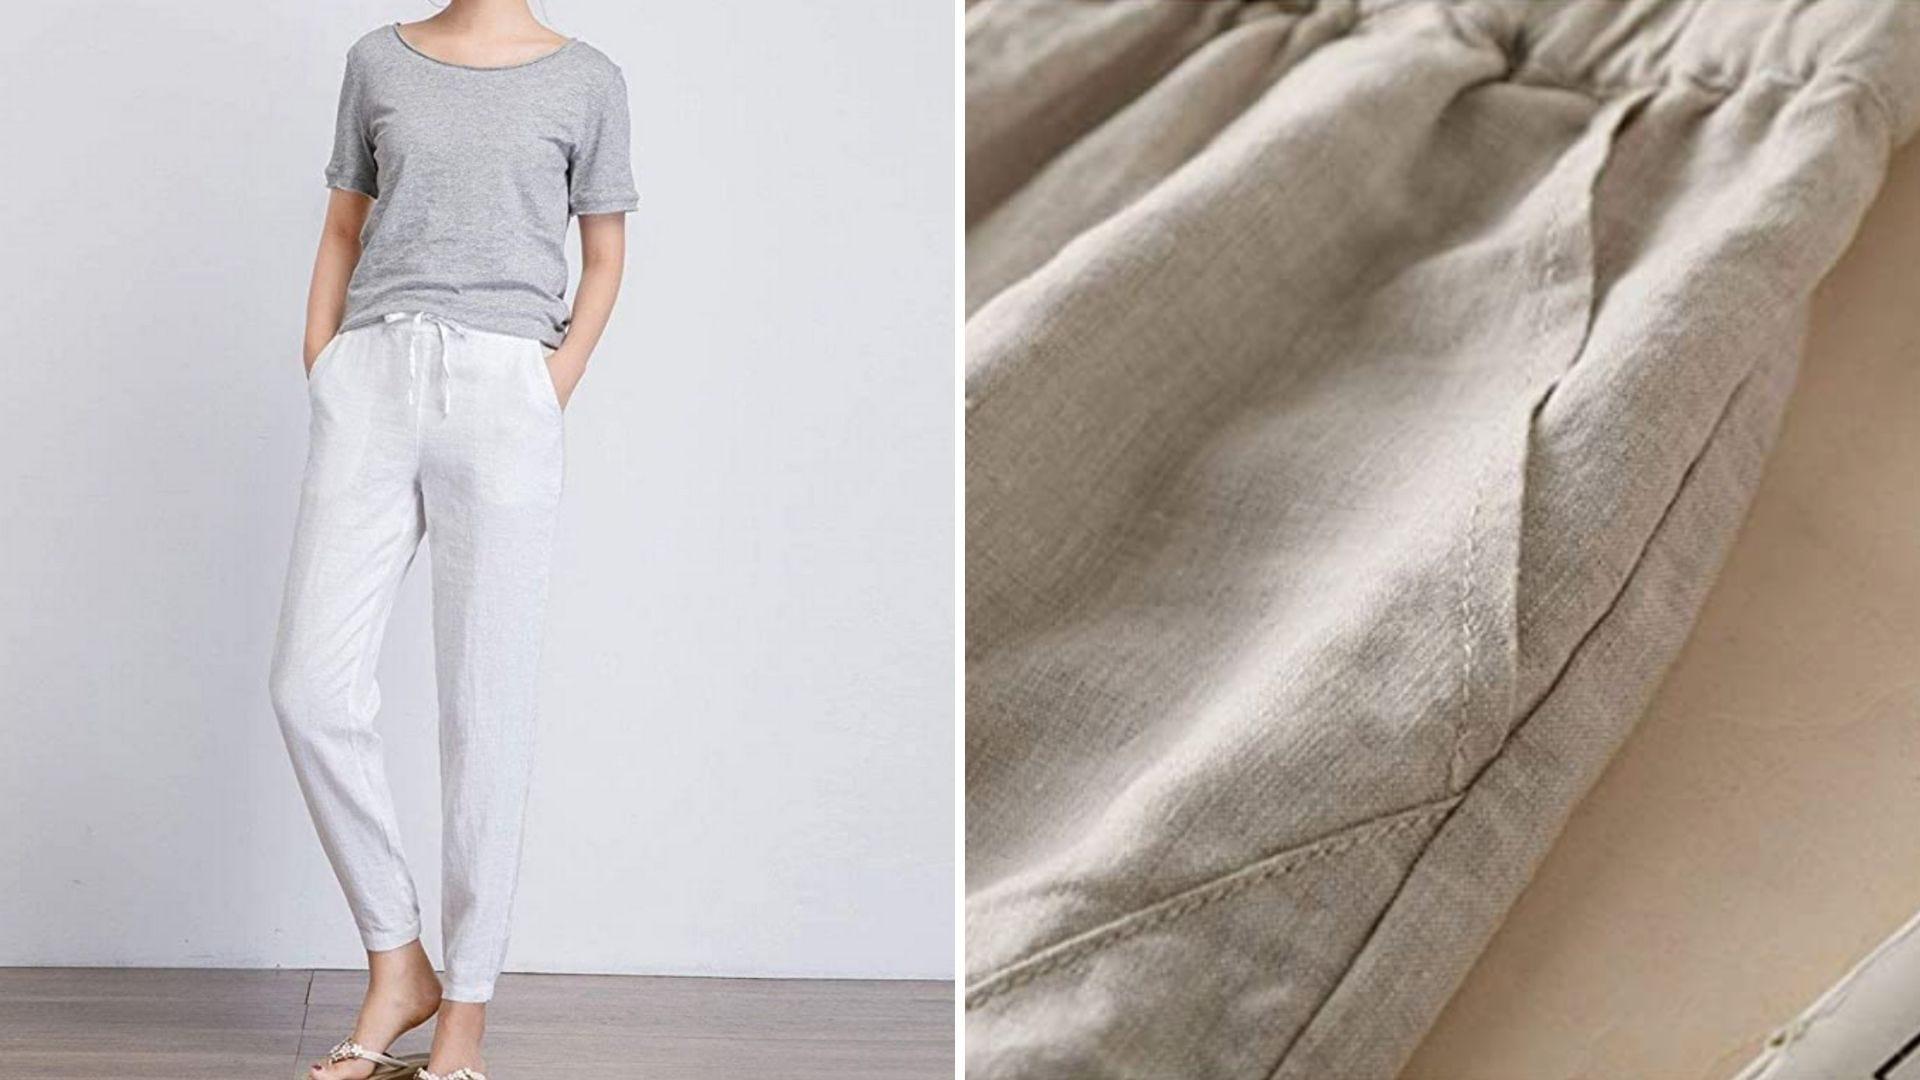 A woman wears white linen pants and a close up shot of tan linen pants